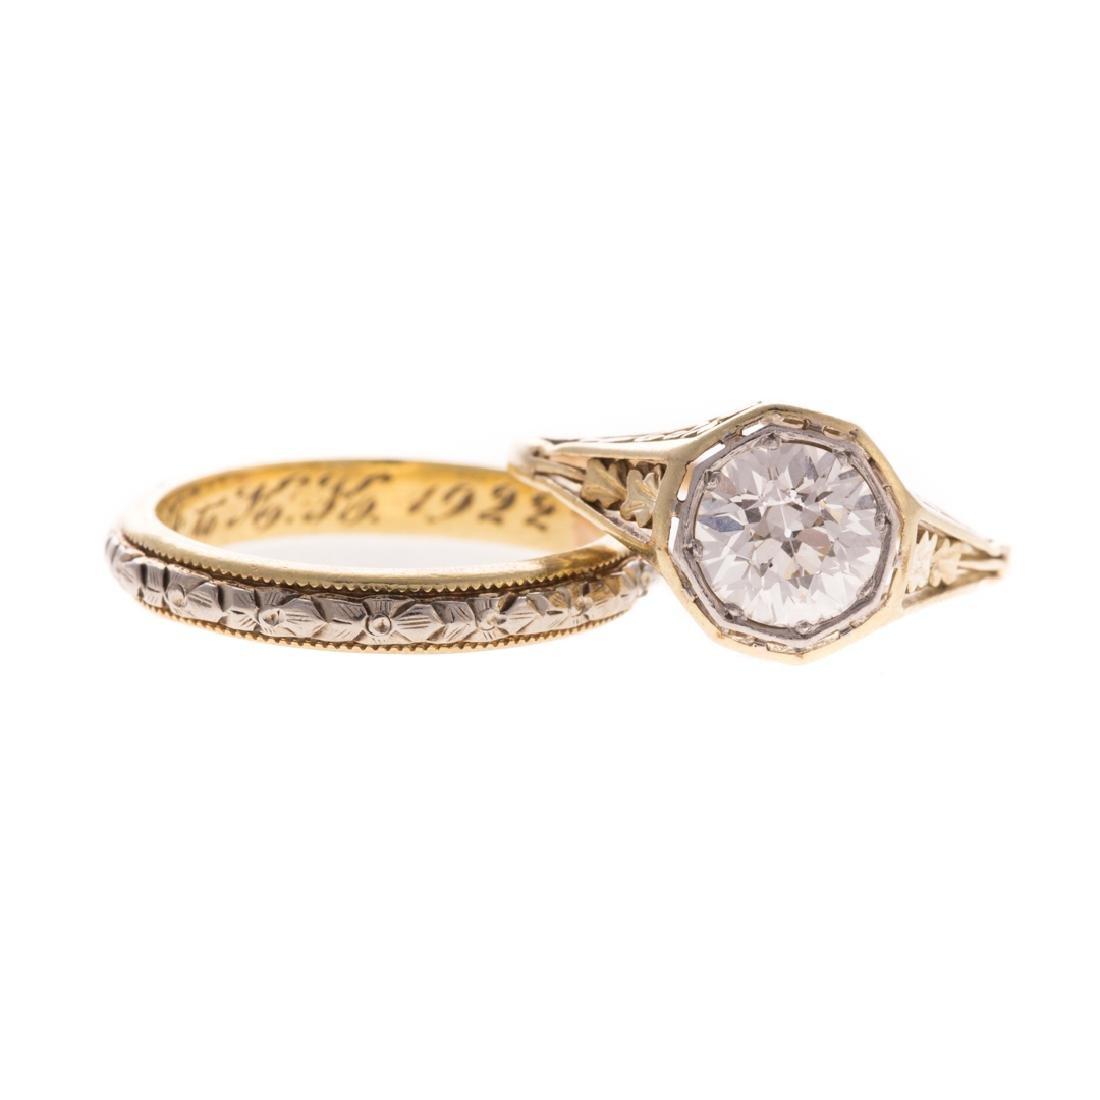 A Victorian Engagement & Wedding Ring Set